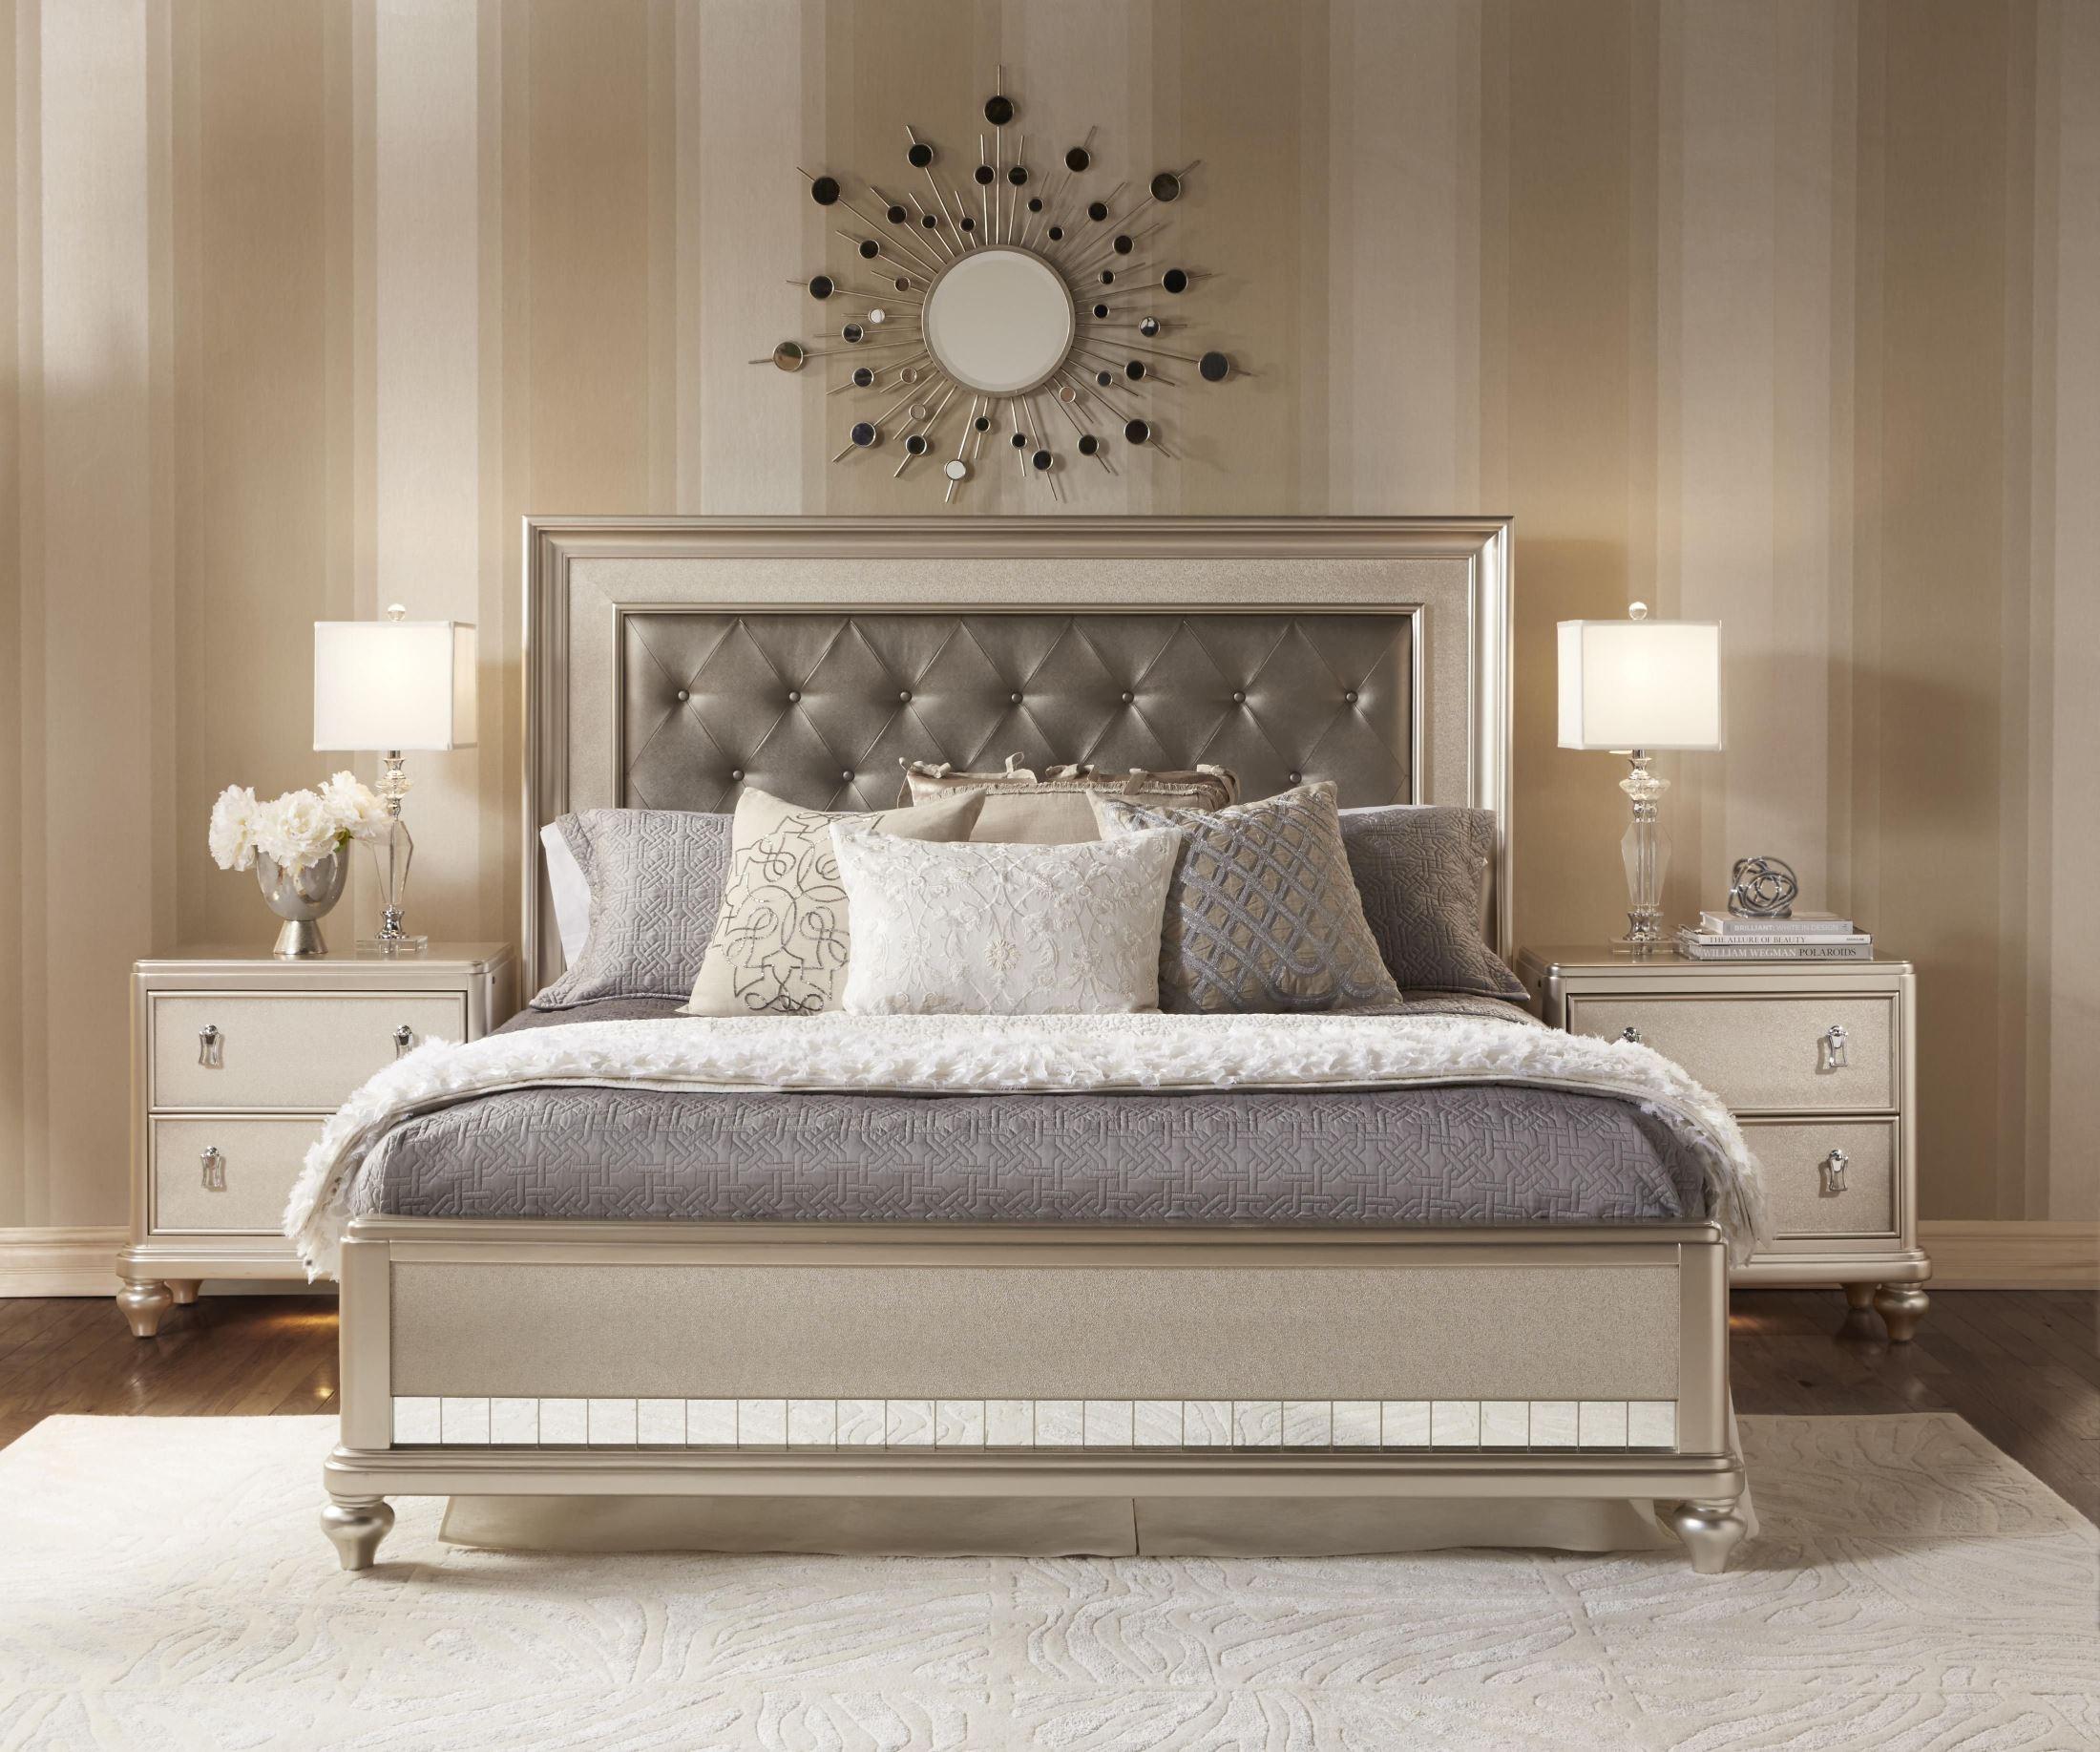 Diva Panel Bedroom Set From Samuel Lawrence 8808 255 257